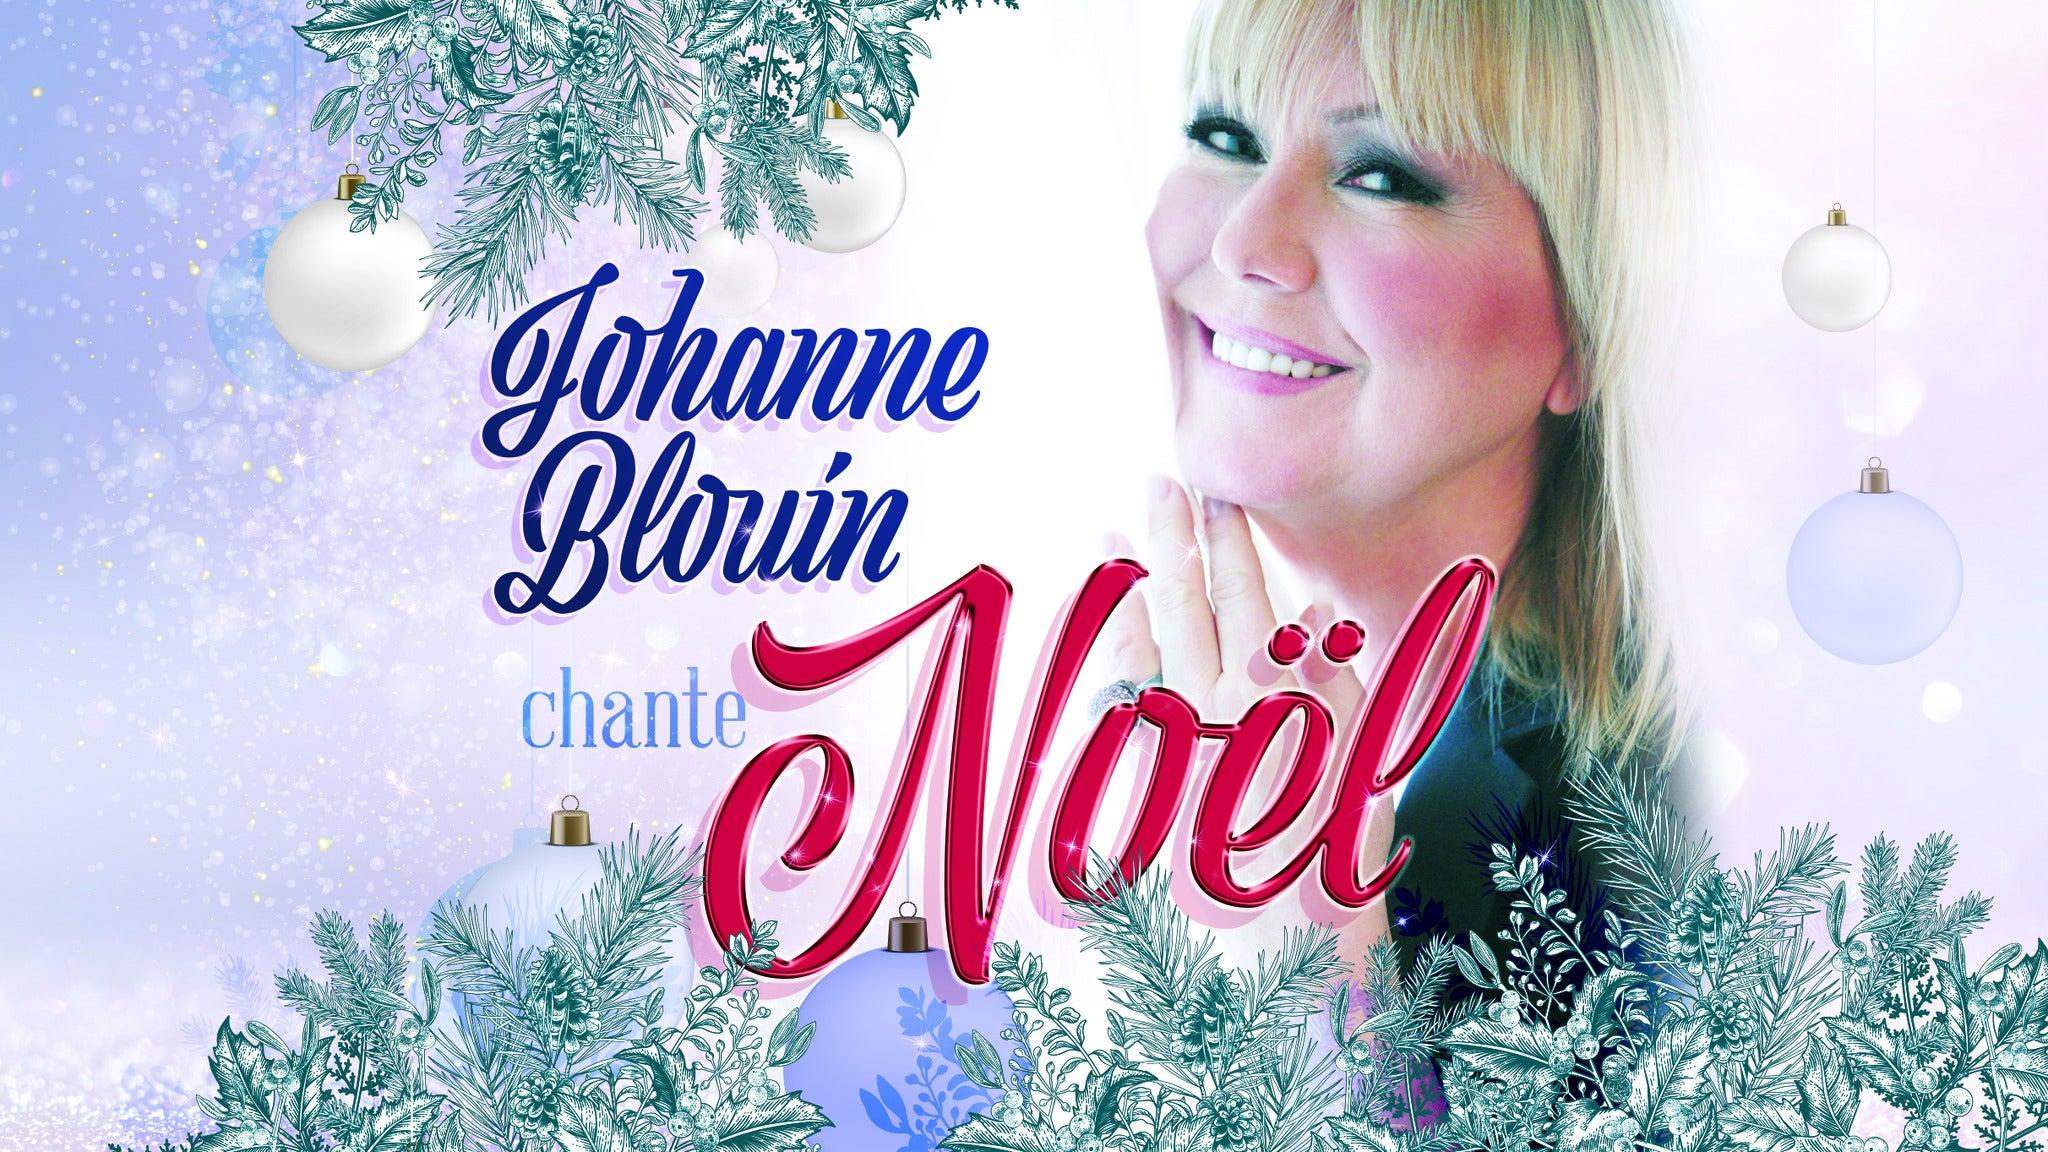 Johanne Blouin Chante Noel tickets (Copyright © Ticketmaster)